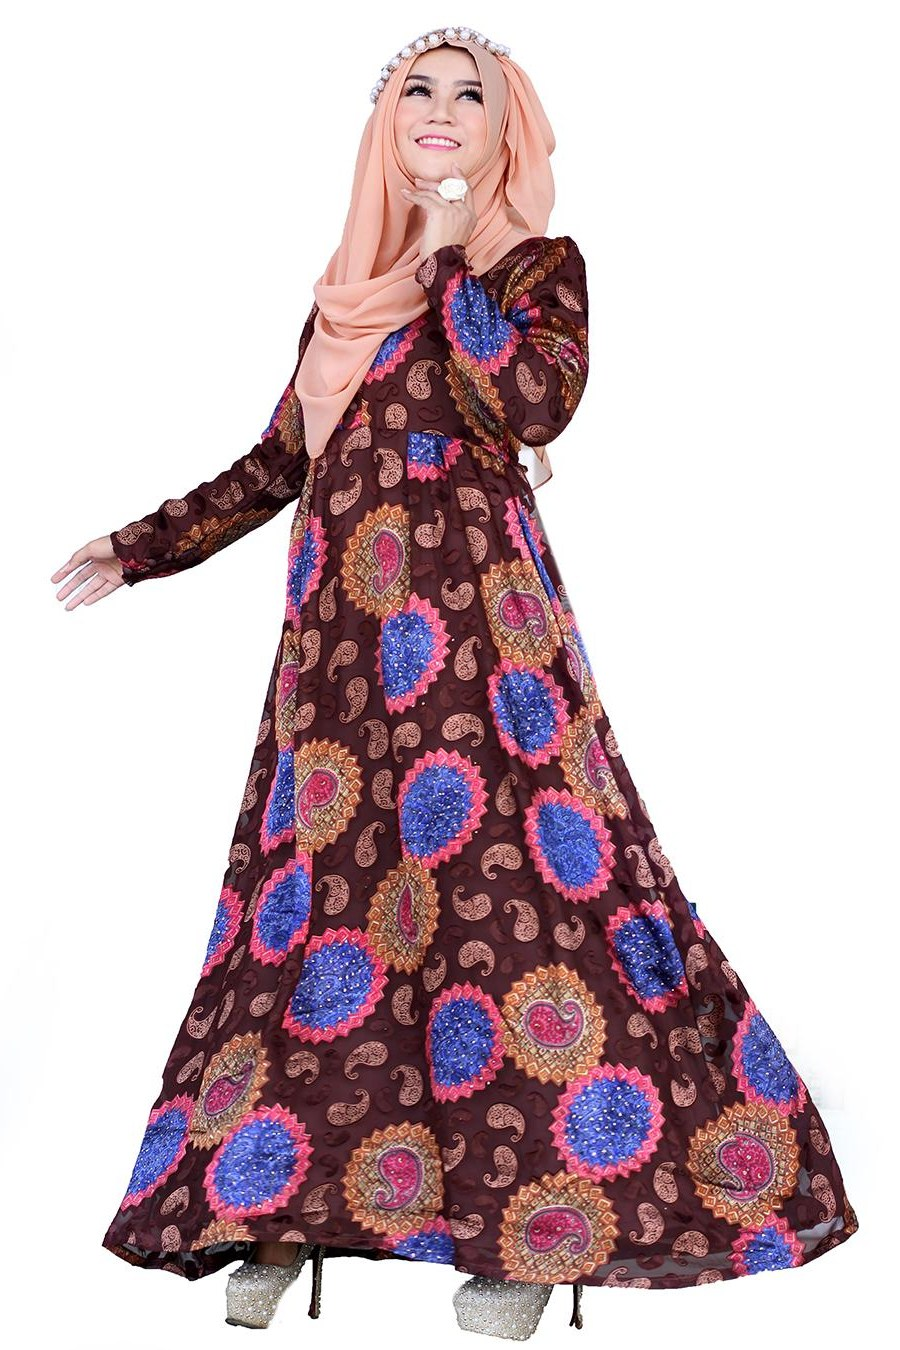 Model Melihat Baju Lebaran 8ydm Alasan Punya Baju Baru Saat Lebaran Hairi Yanti S Blog